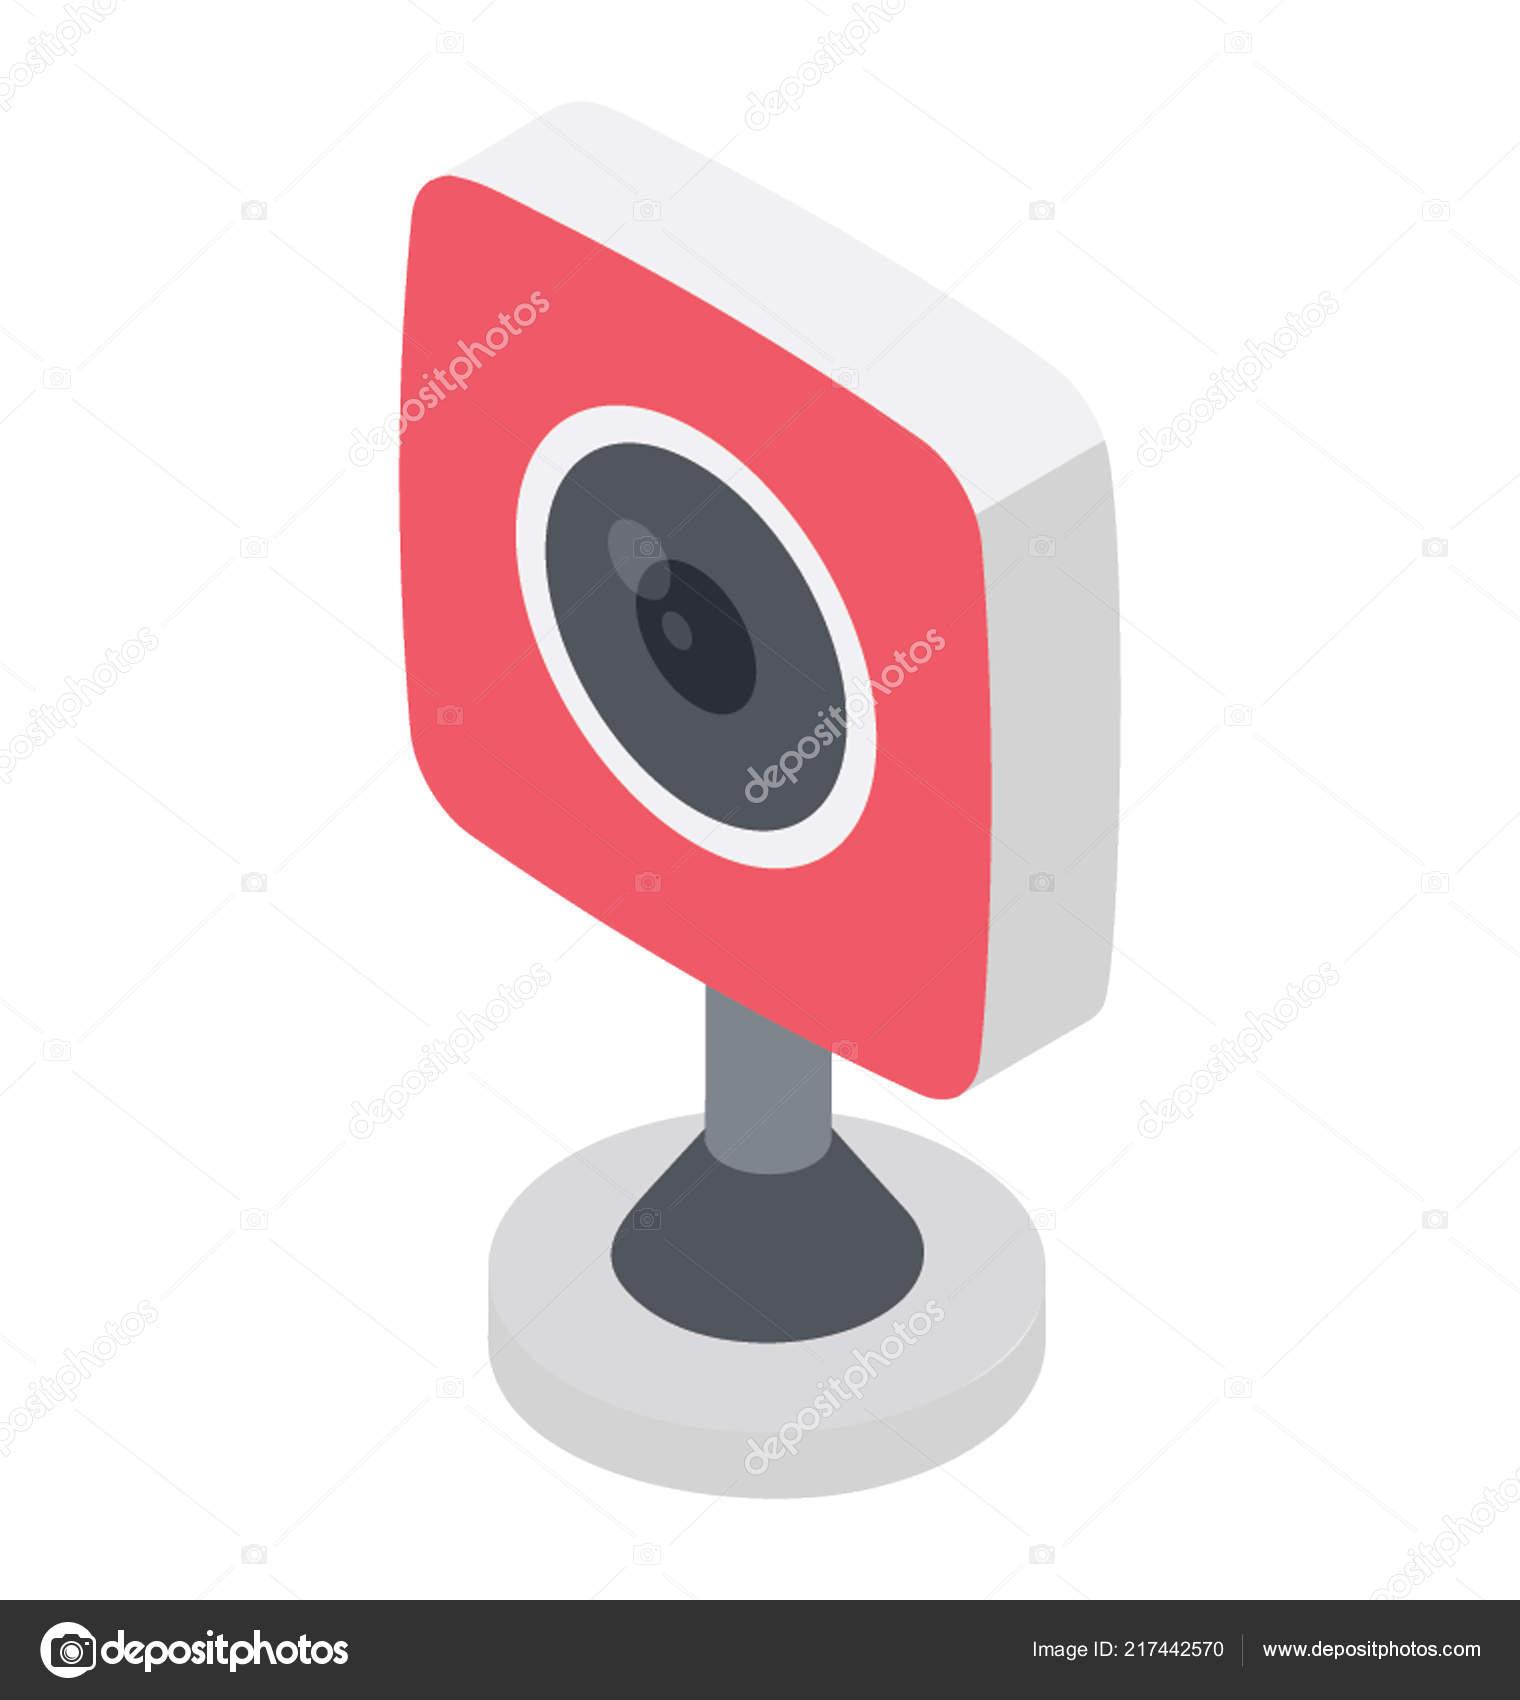 Chat Cámara - Lista de canales gratis